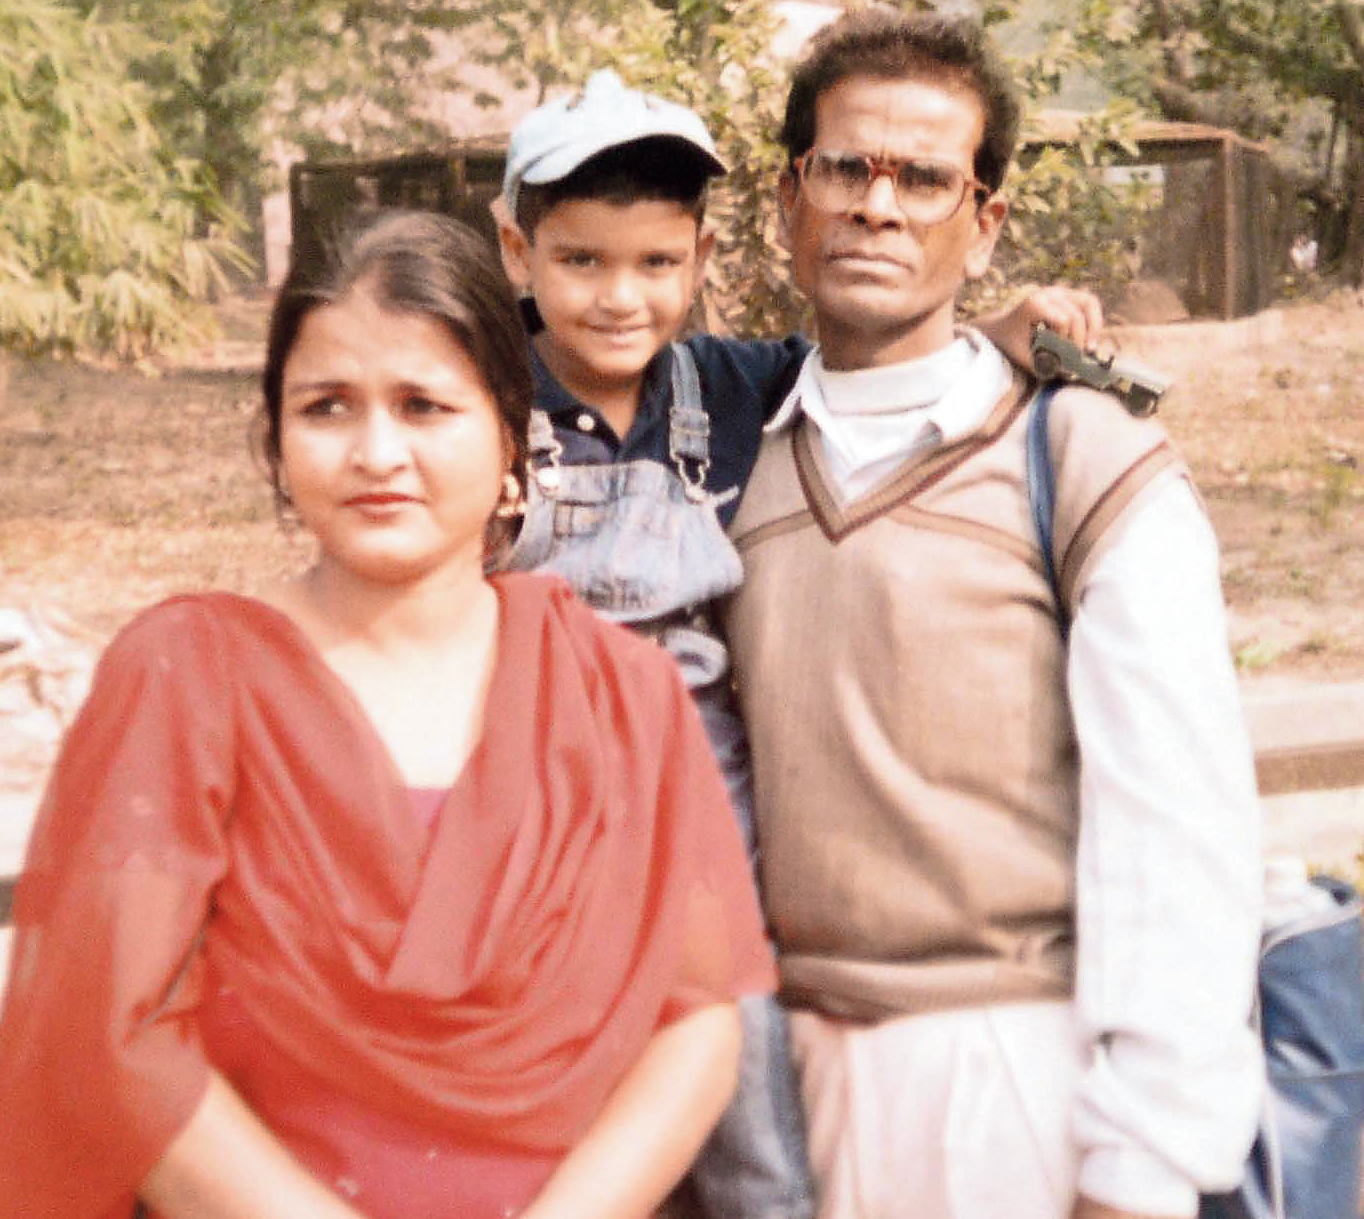 Sajal Kumar Kanjilal with cousin Rajkumar Mukherjee's wife and son.